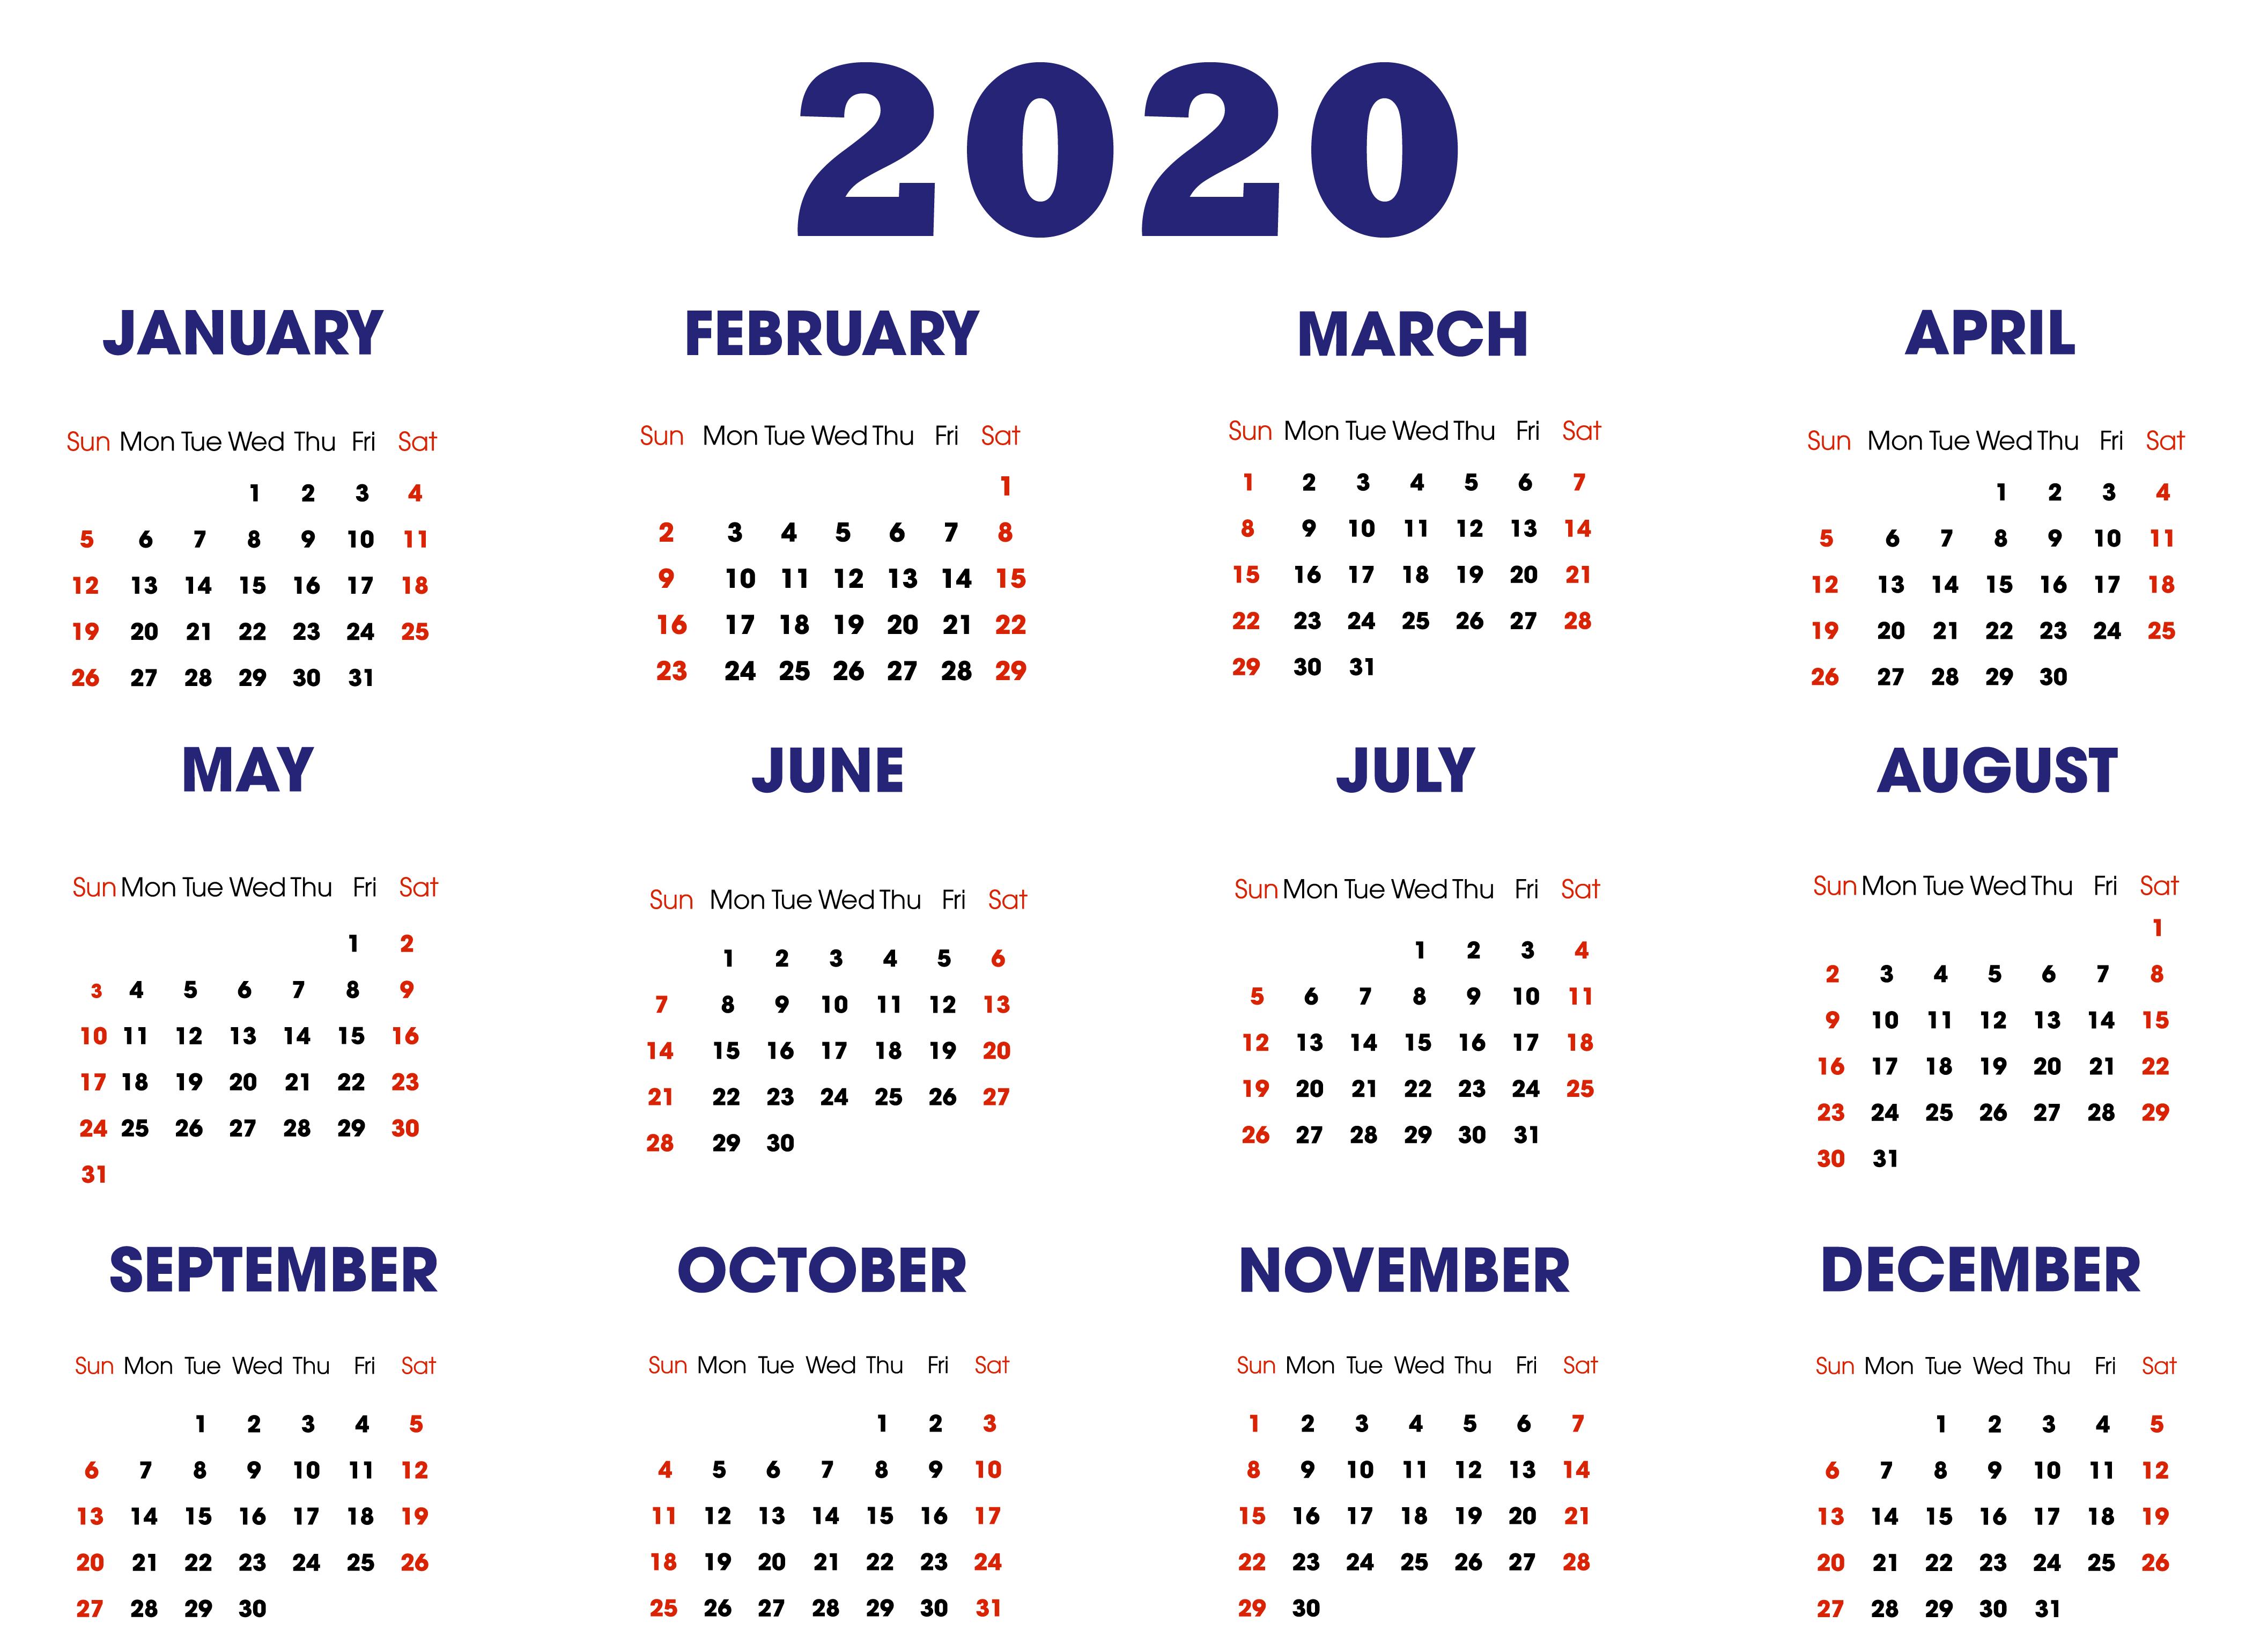 2020 Calendar Template 2020 Calendar Template Calendar Template Free Printable Calendar Templates